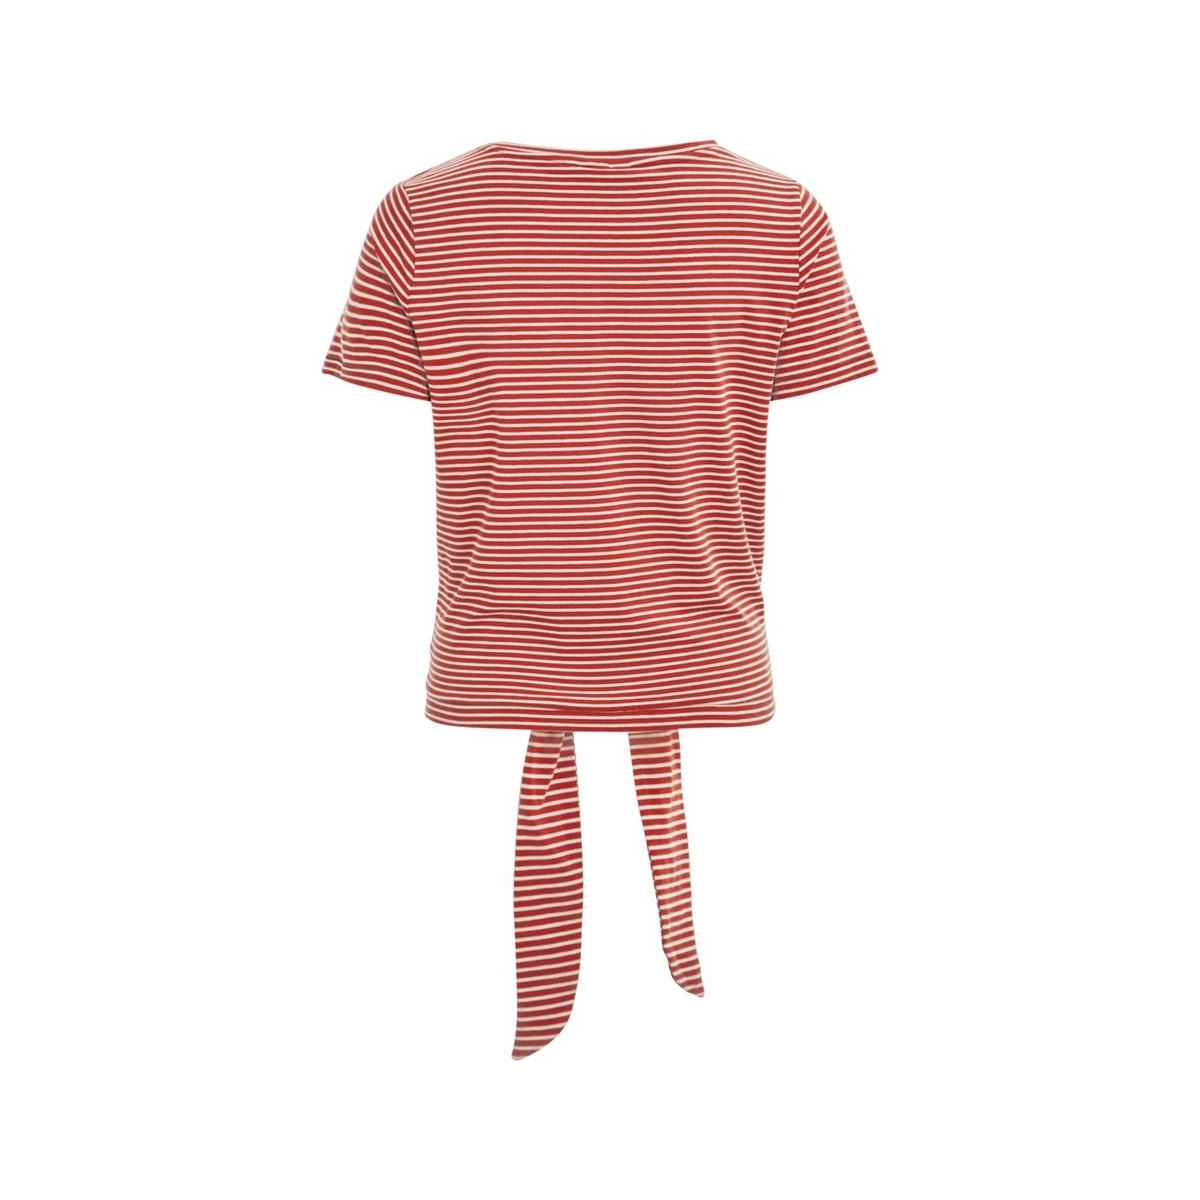 objstephanie maxwell s/s top season 23029400 object t-shirt tandori spice/white